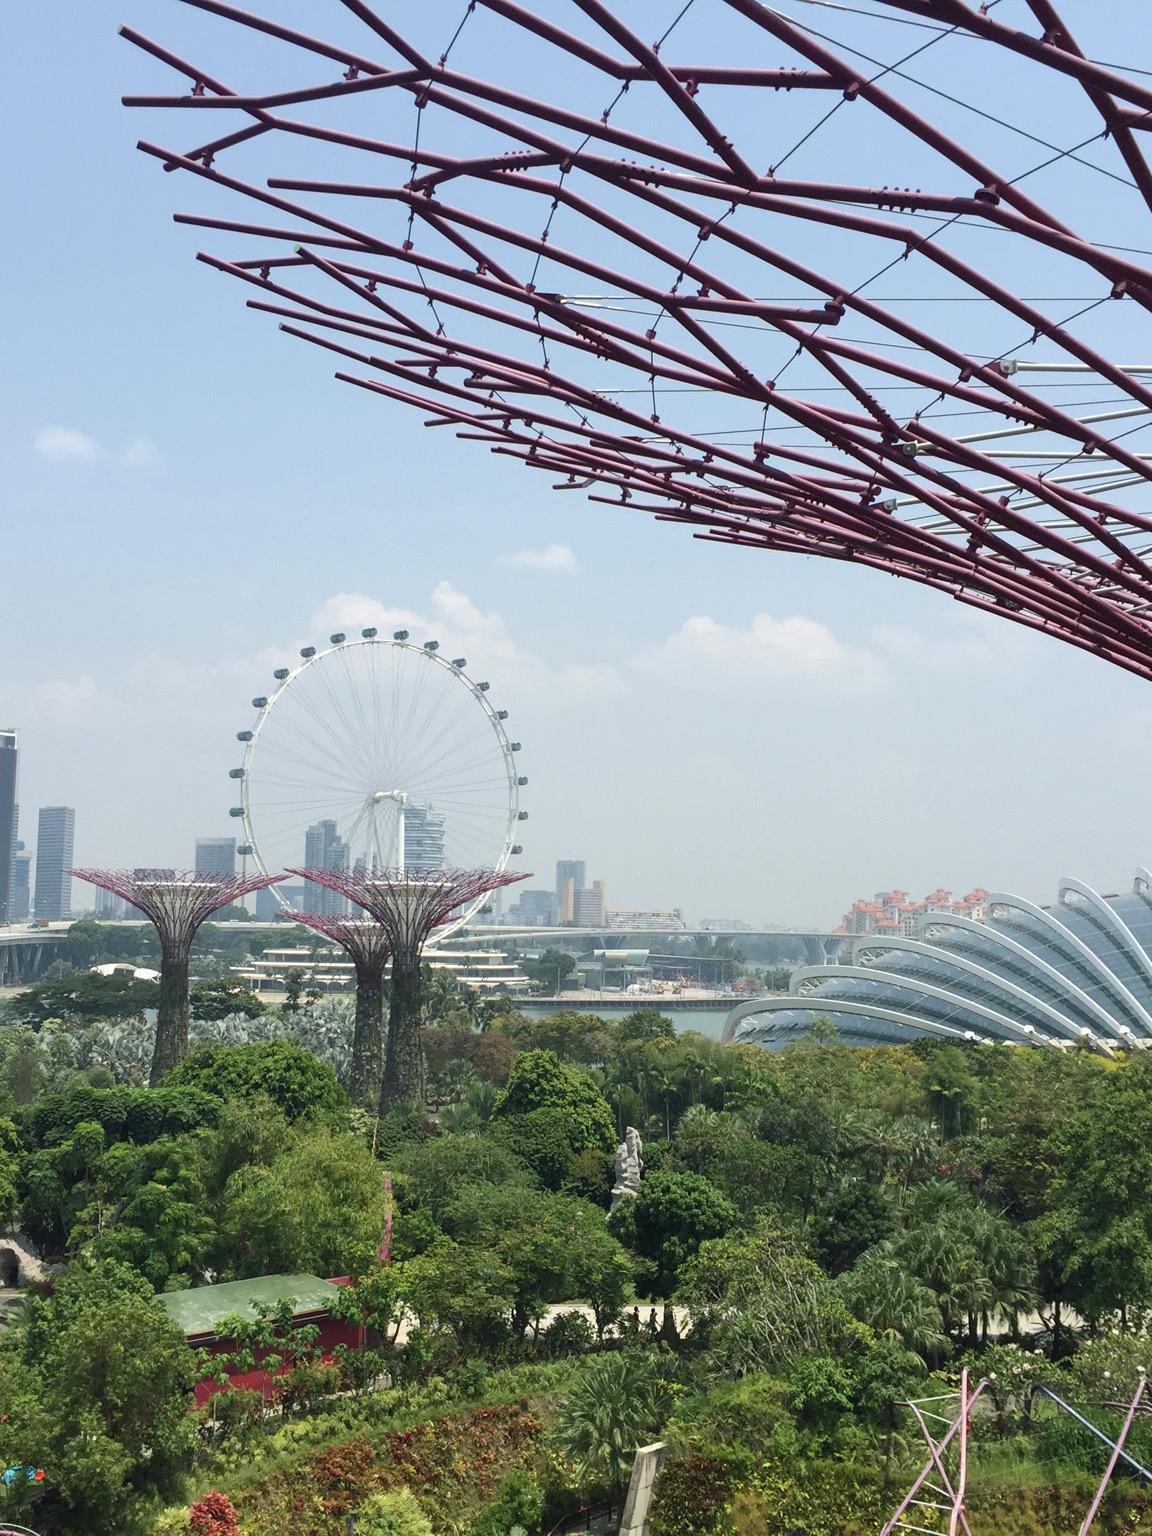 Singapore_4472 cropped.jpg